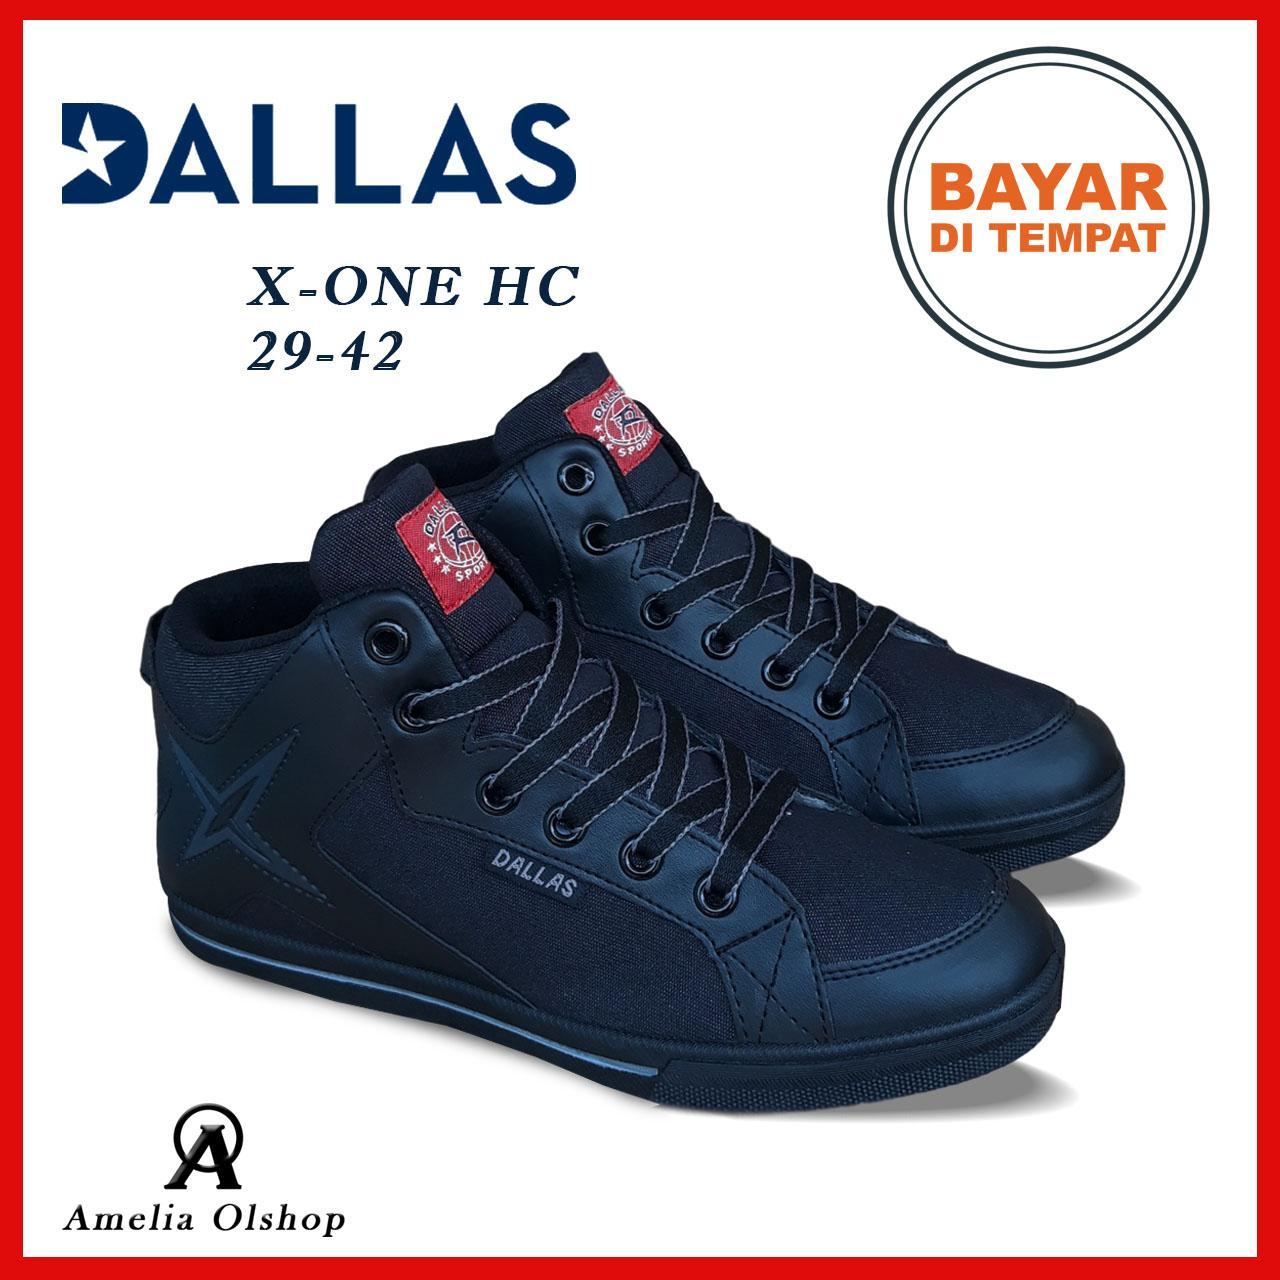 Amelia Olshop - Sepatu Sekolah DALLAS X-ONE 29-40   Sepatu Sekolah anak 7ce2292bed